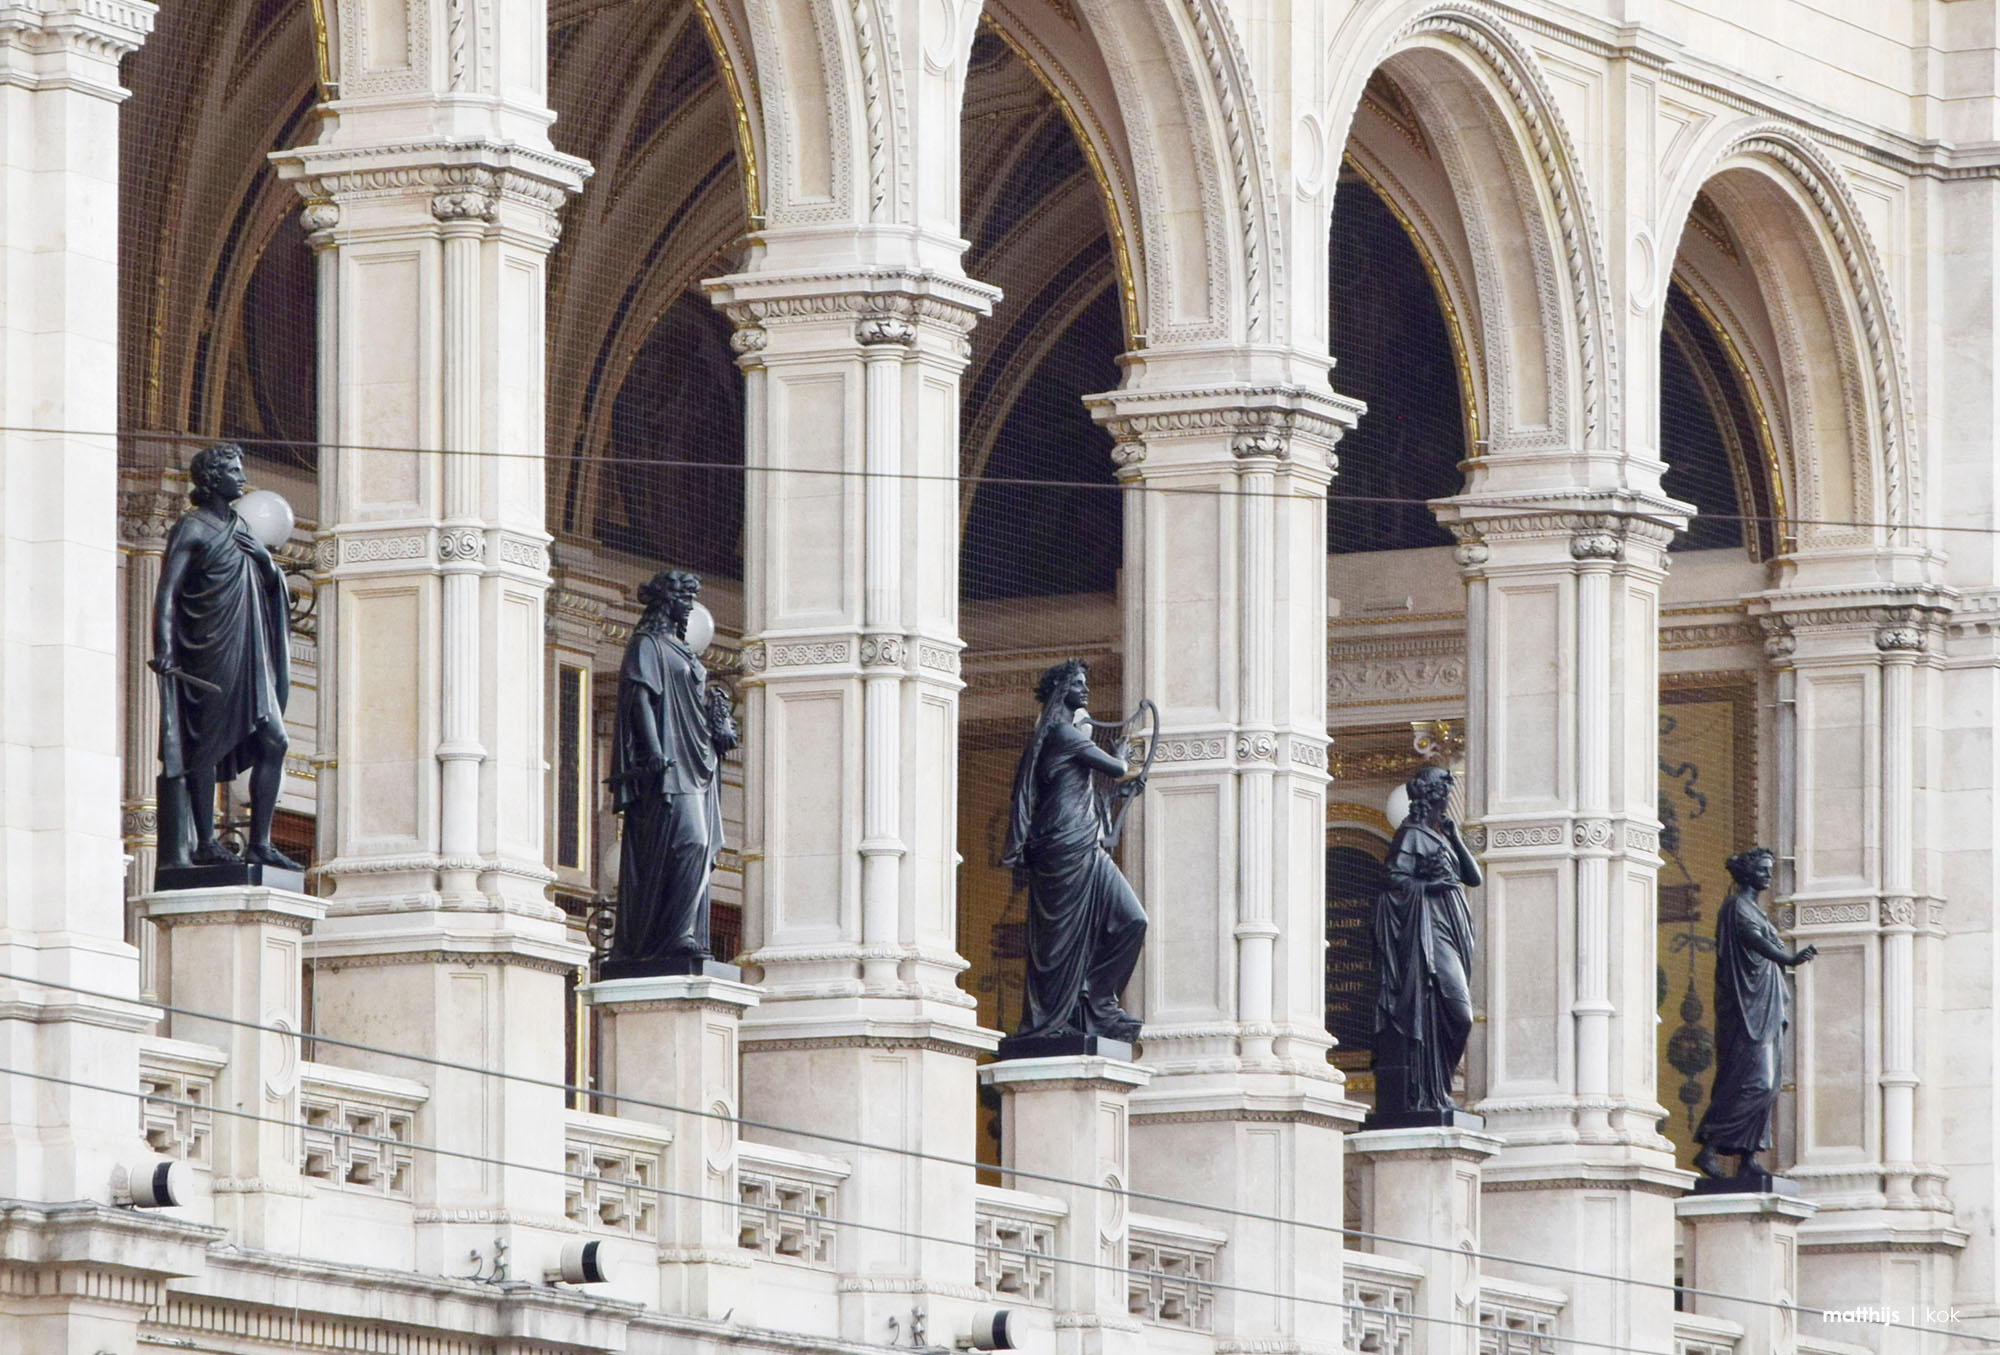 Wiener Staatsoper, State Opera, Vienna, Austria | Photo by Matthijs Kok